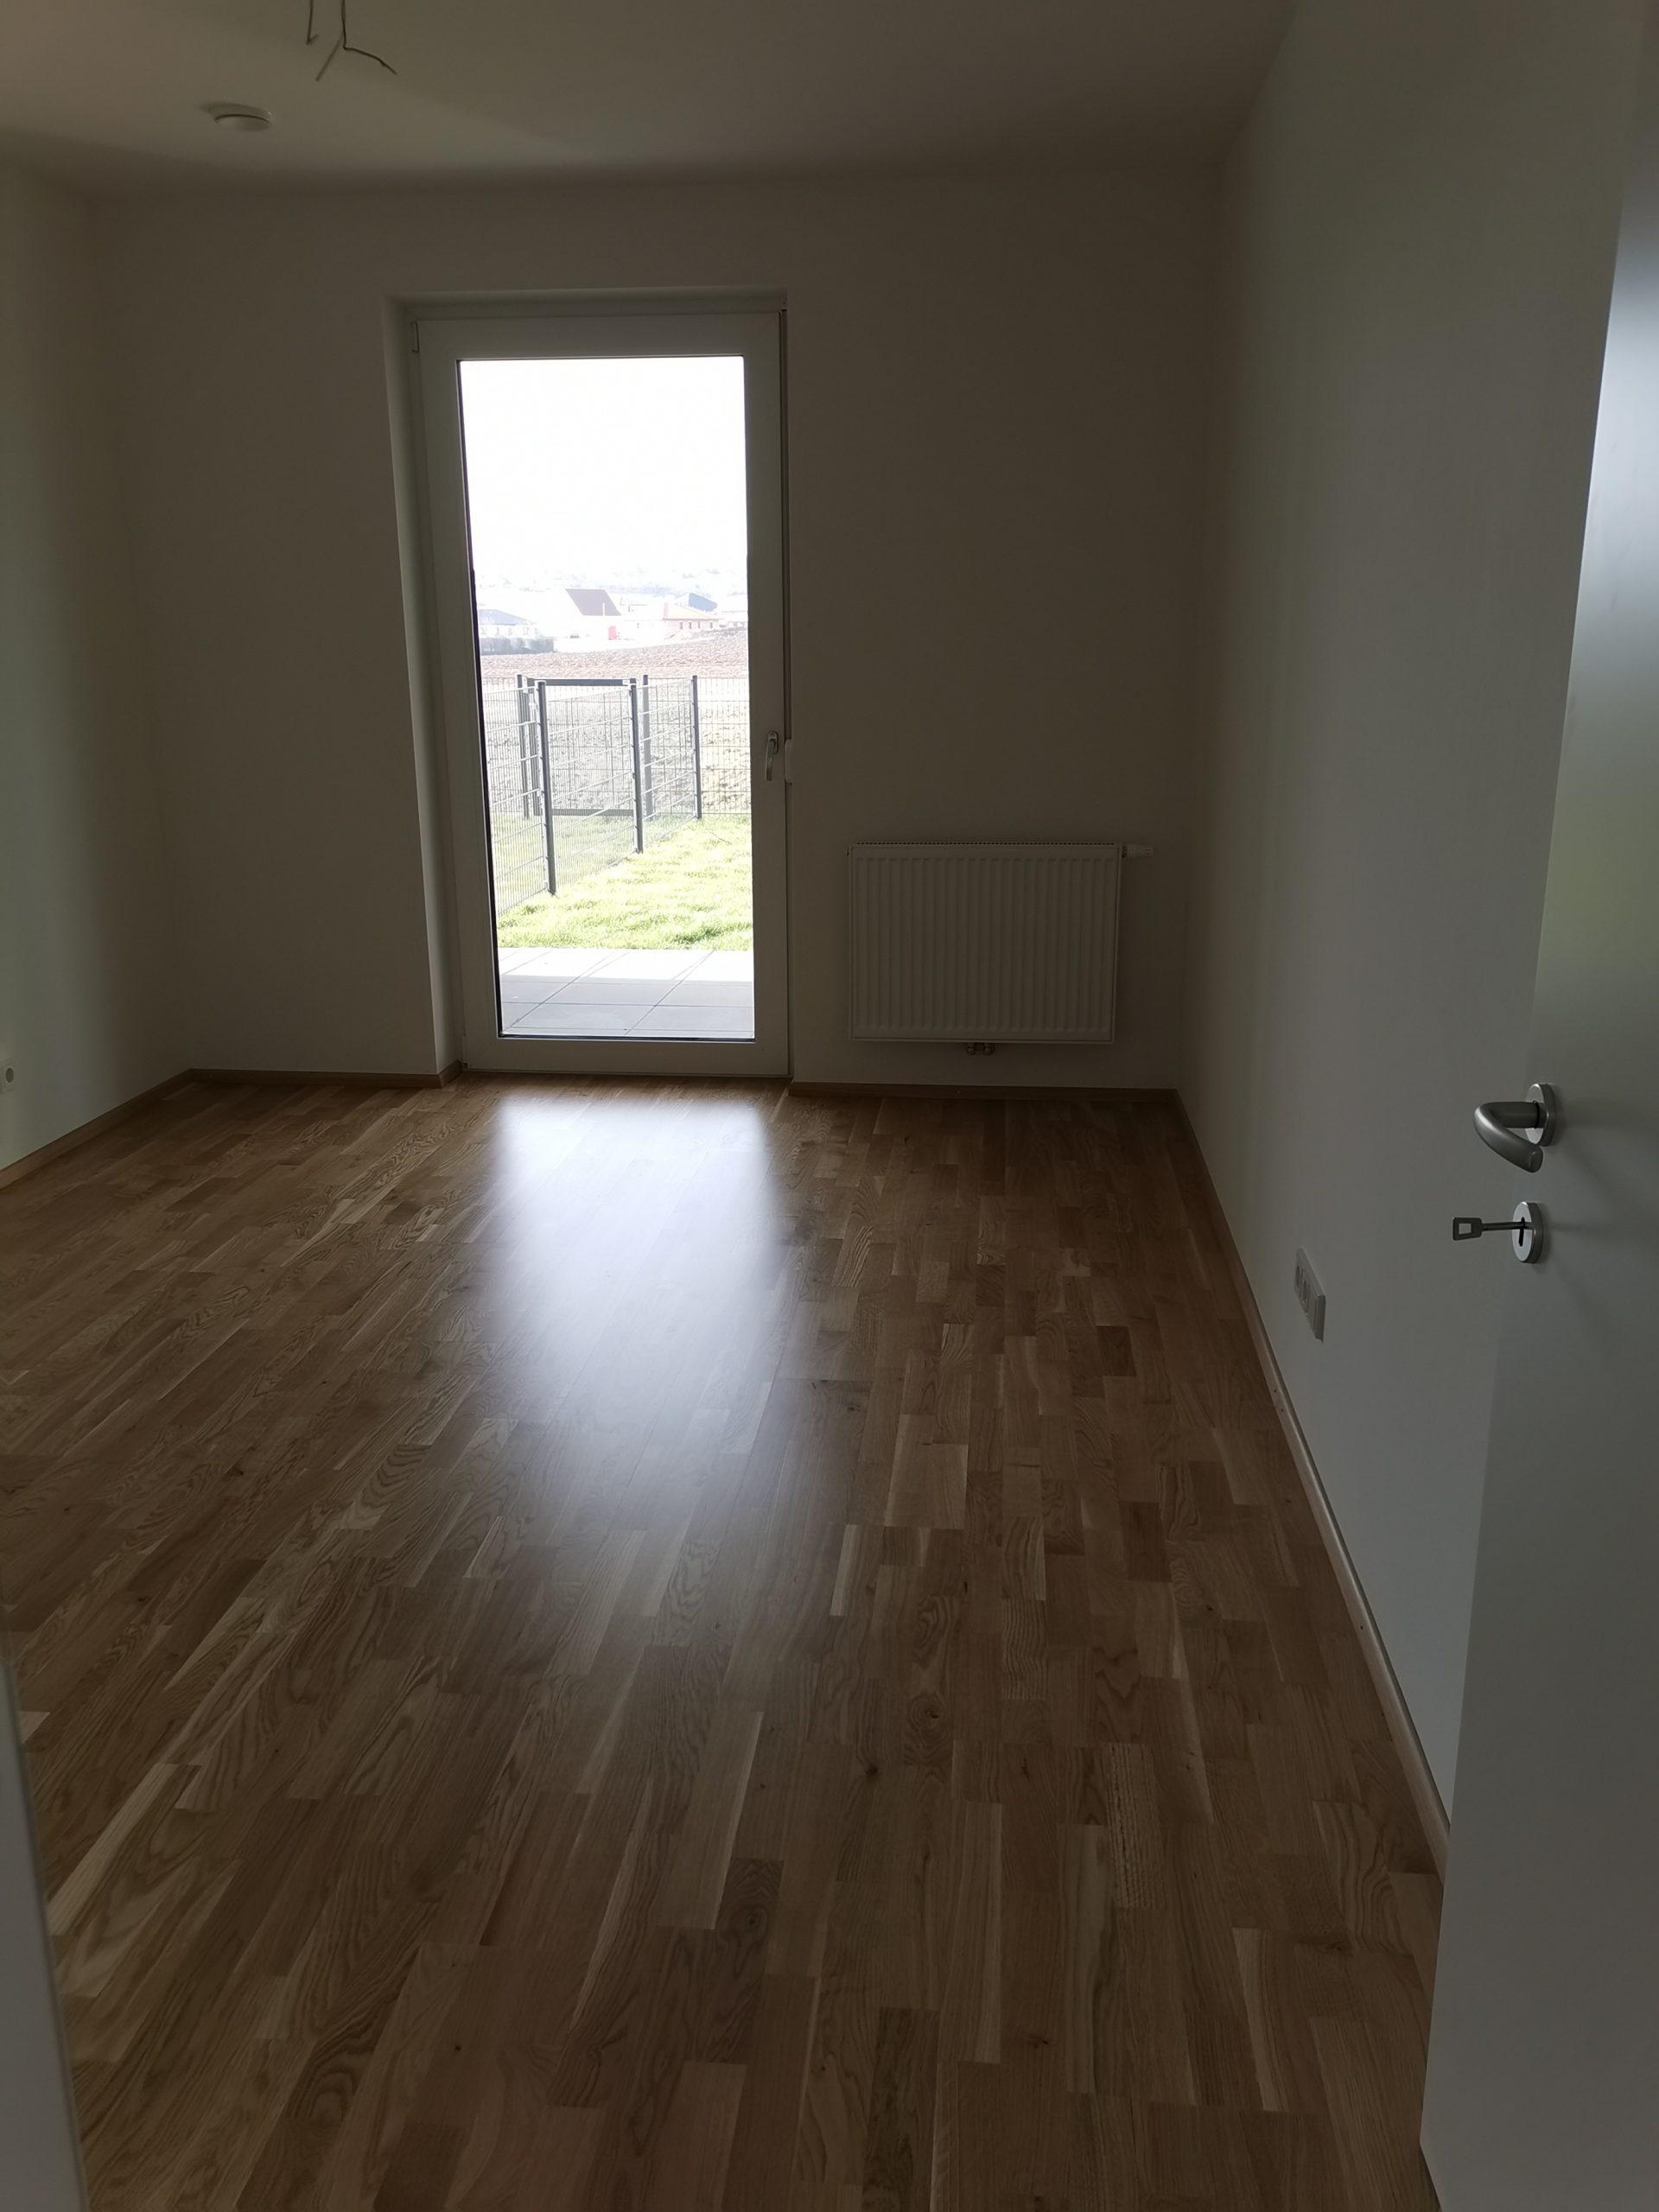 Immobilie von Kamptal in 3730 Eggenburg, Horn, Eggenburg VII - Top 203 #4